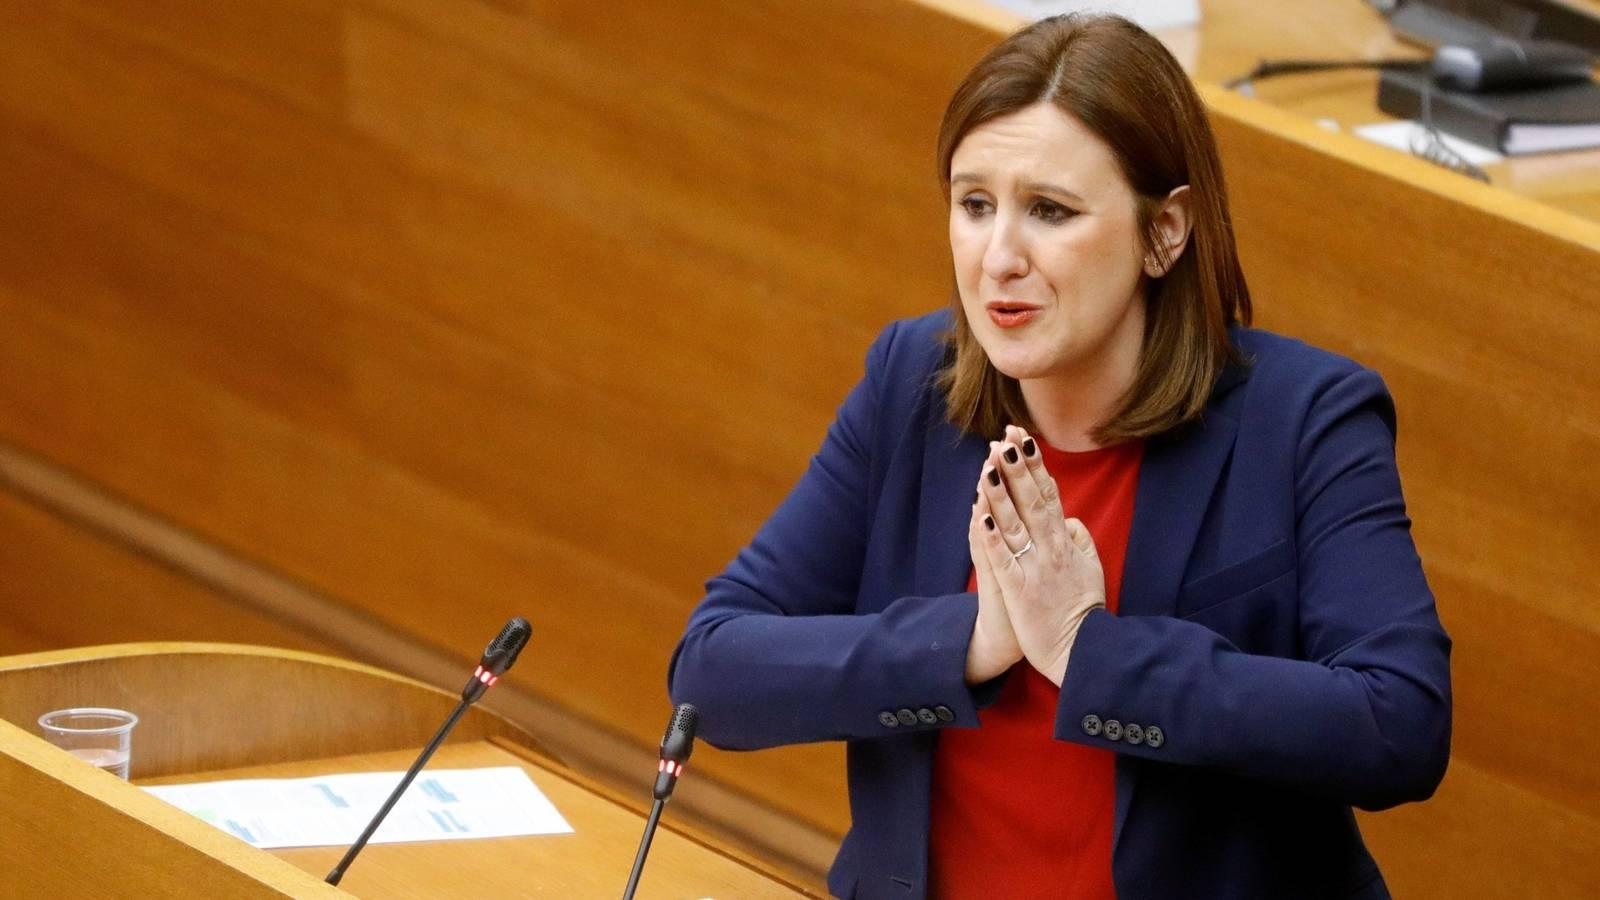 maria jose catala sera la candidata del pp a la alcaldia de valencia